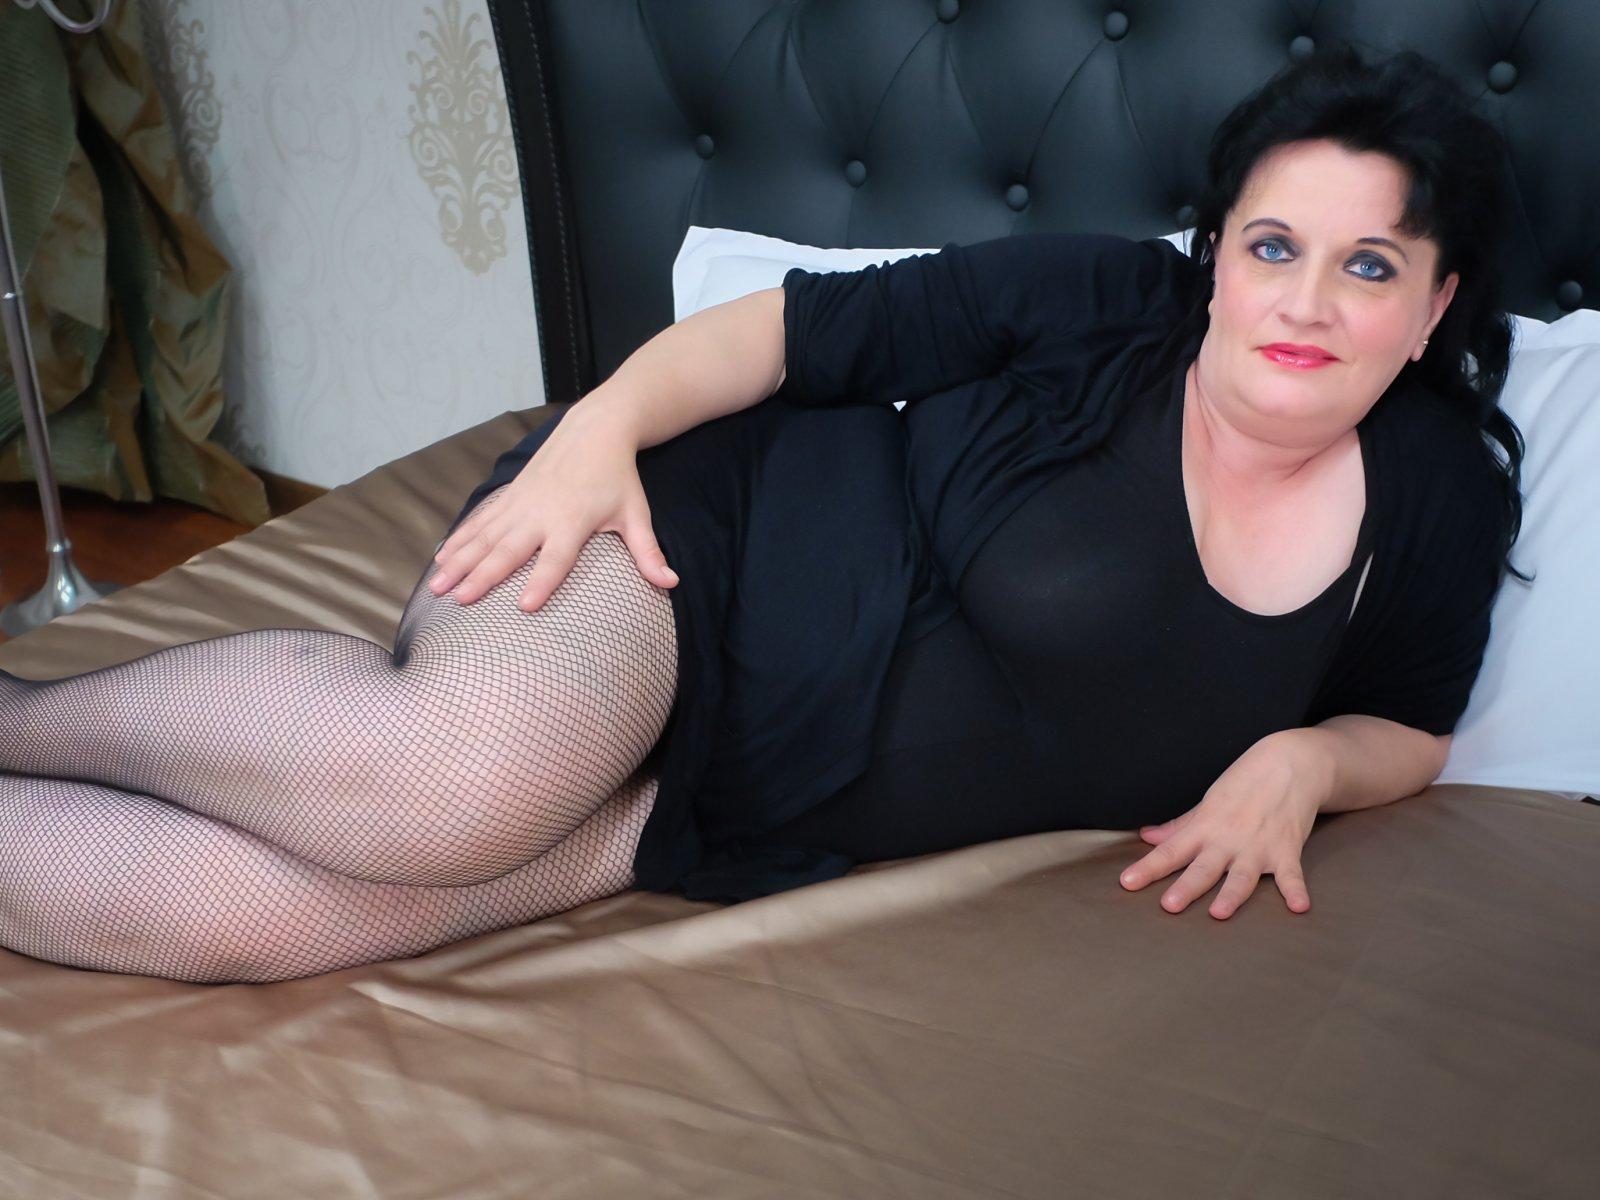 секс-толстушки в фото немного вниз